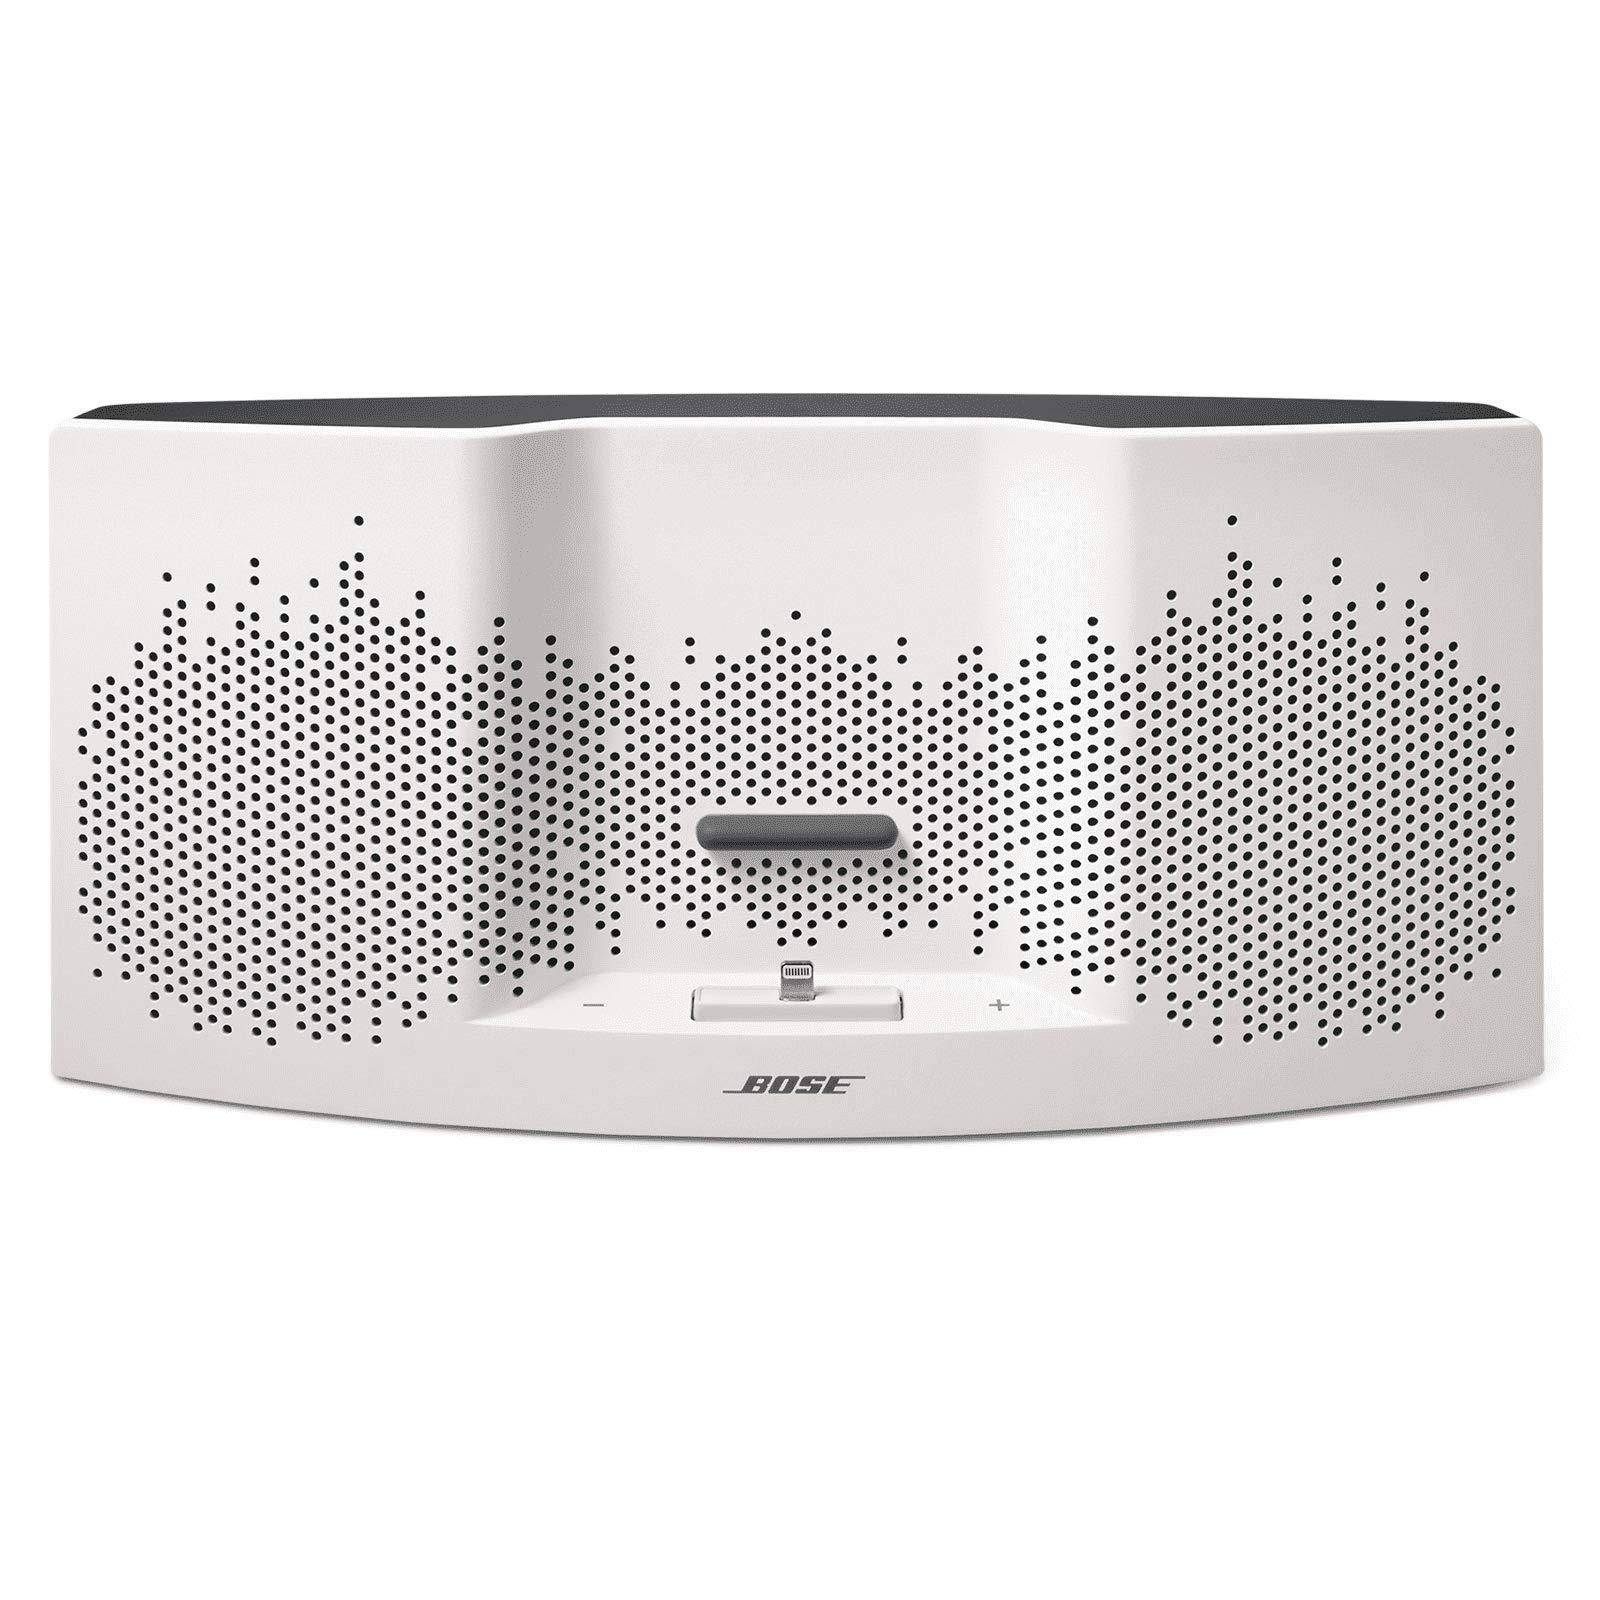 Bose SoundDock XT Speaker (White/Dark Gray) (Renewed) by Bose